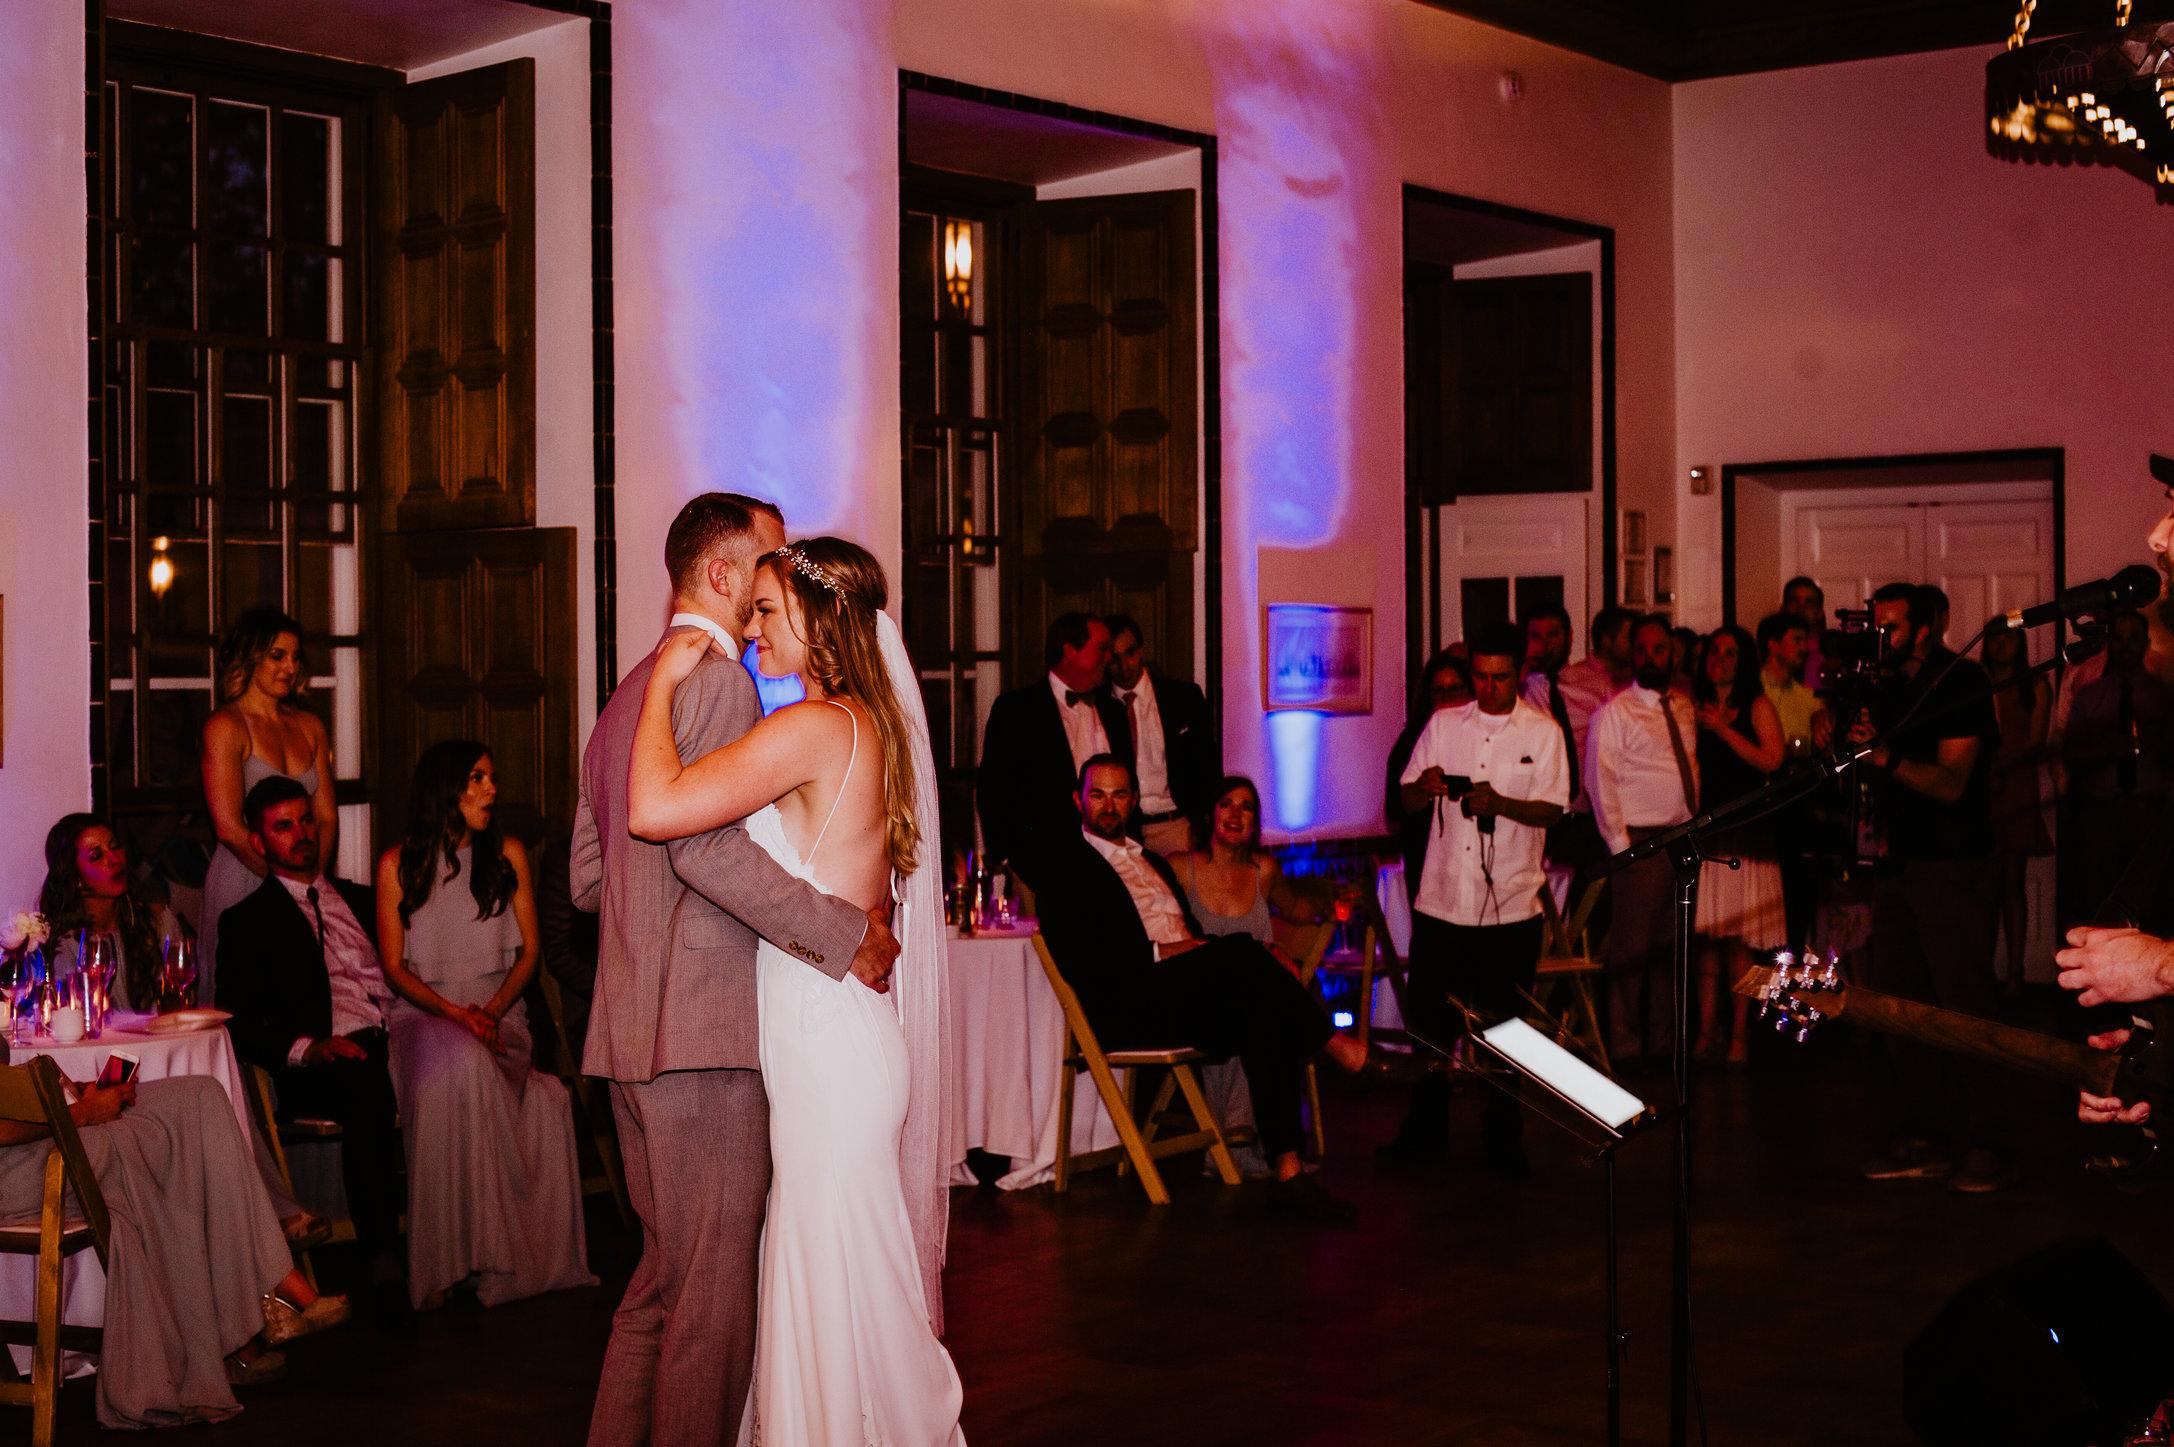 DandA-wedding-795.jpg